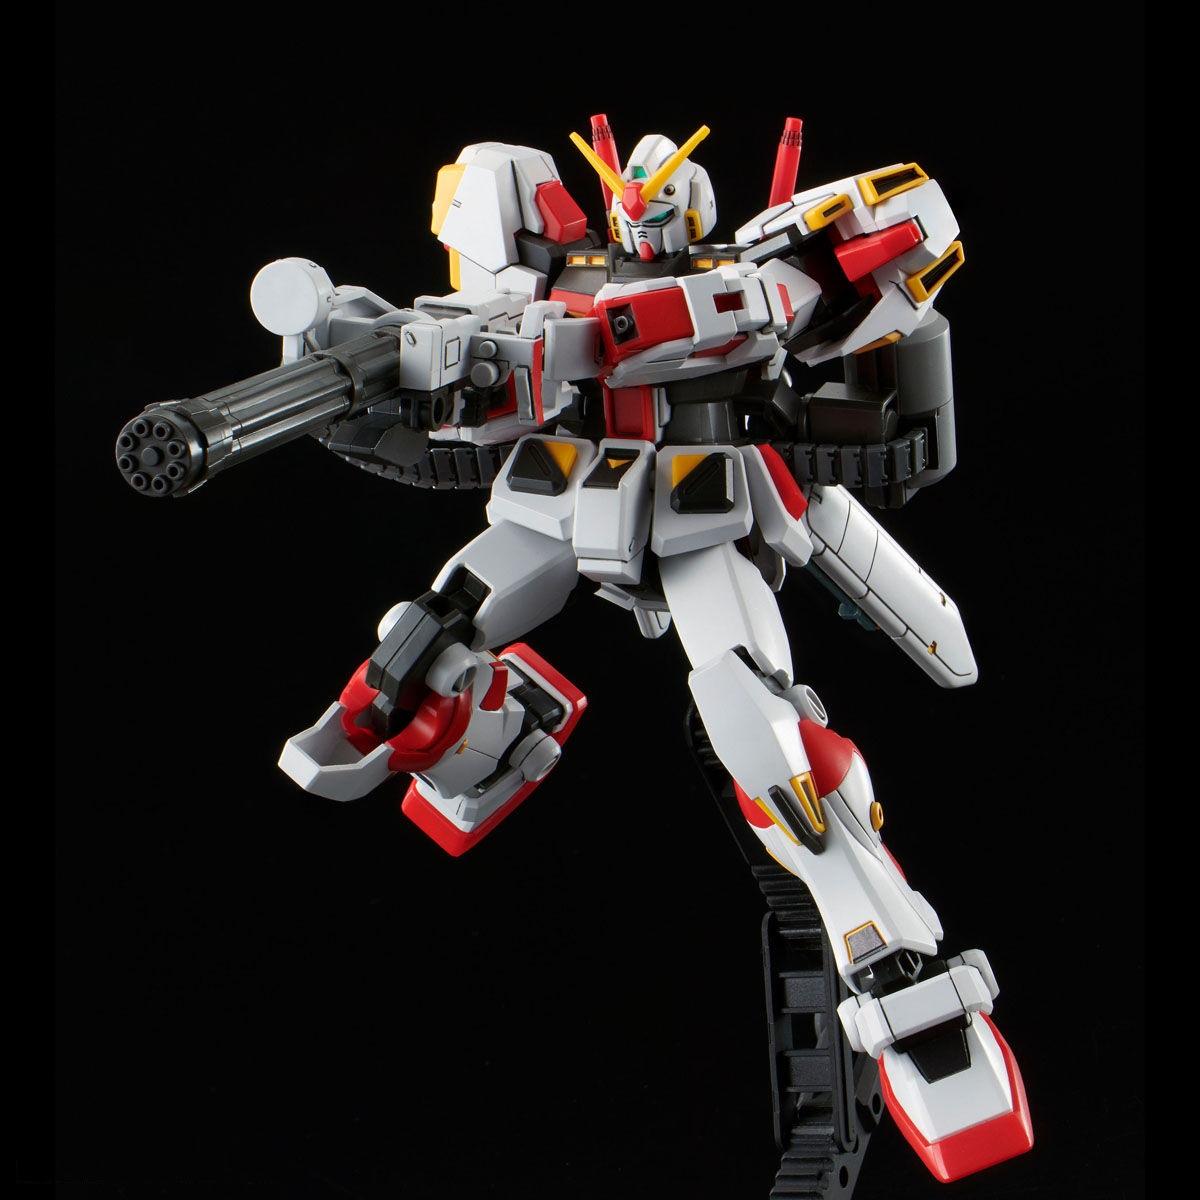 HG 1/144 GUNDAM G05